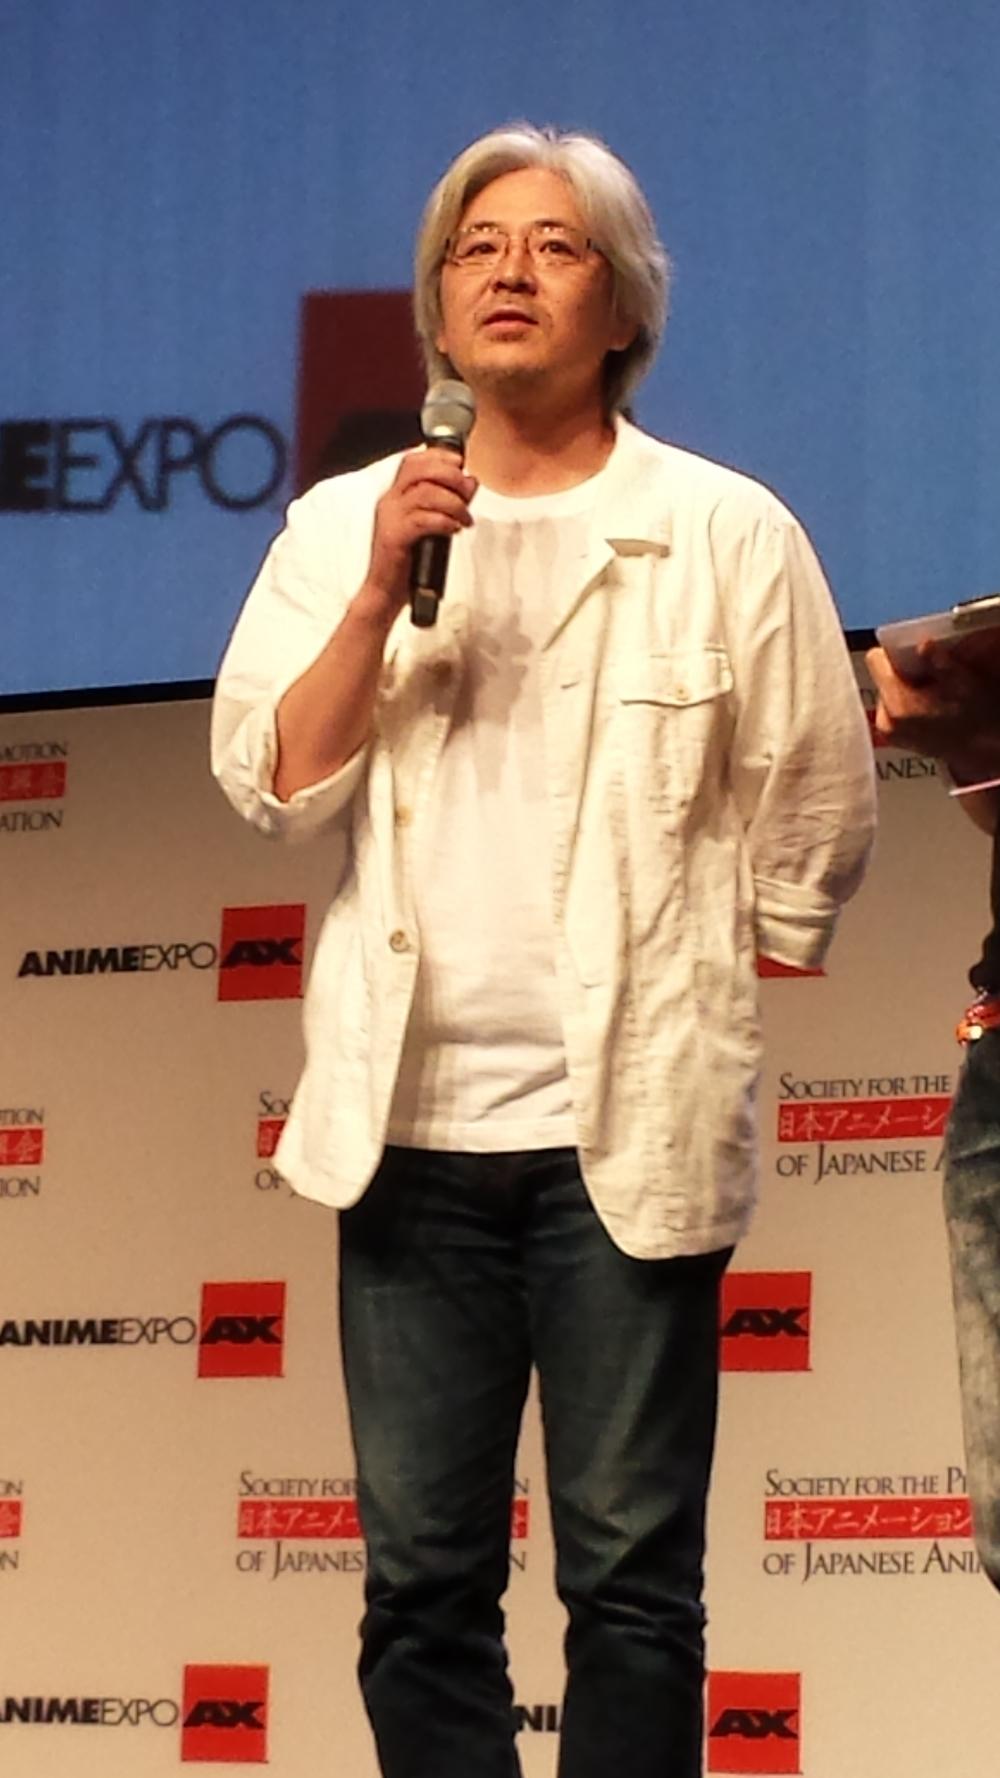 AnimeExpo 2013 - Kazuchika Kise at closing ceremonies  -